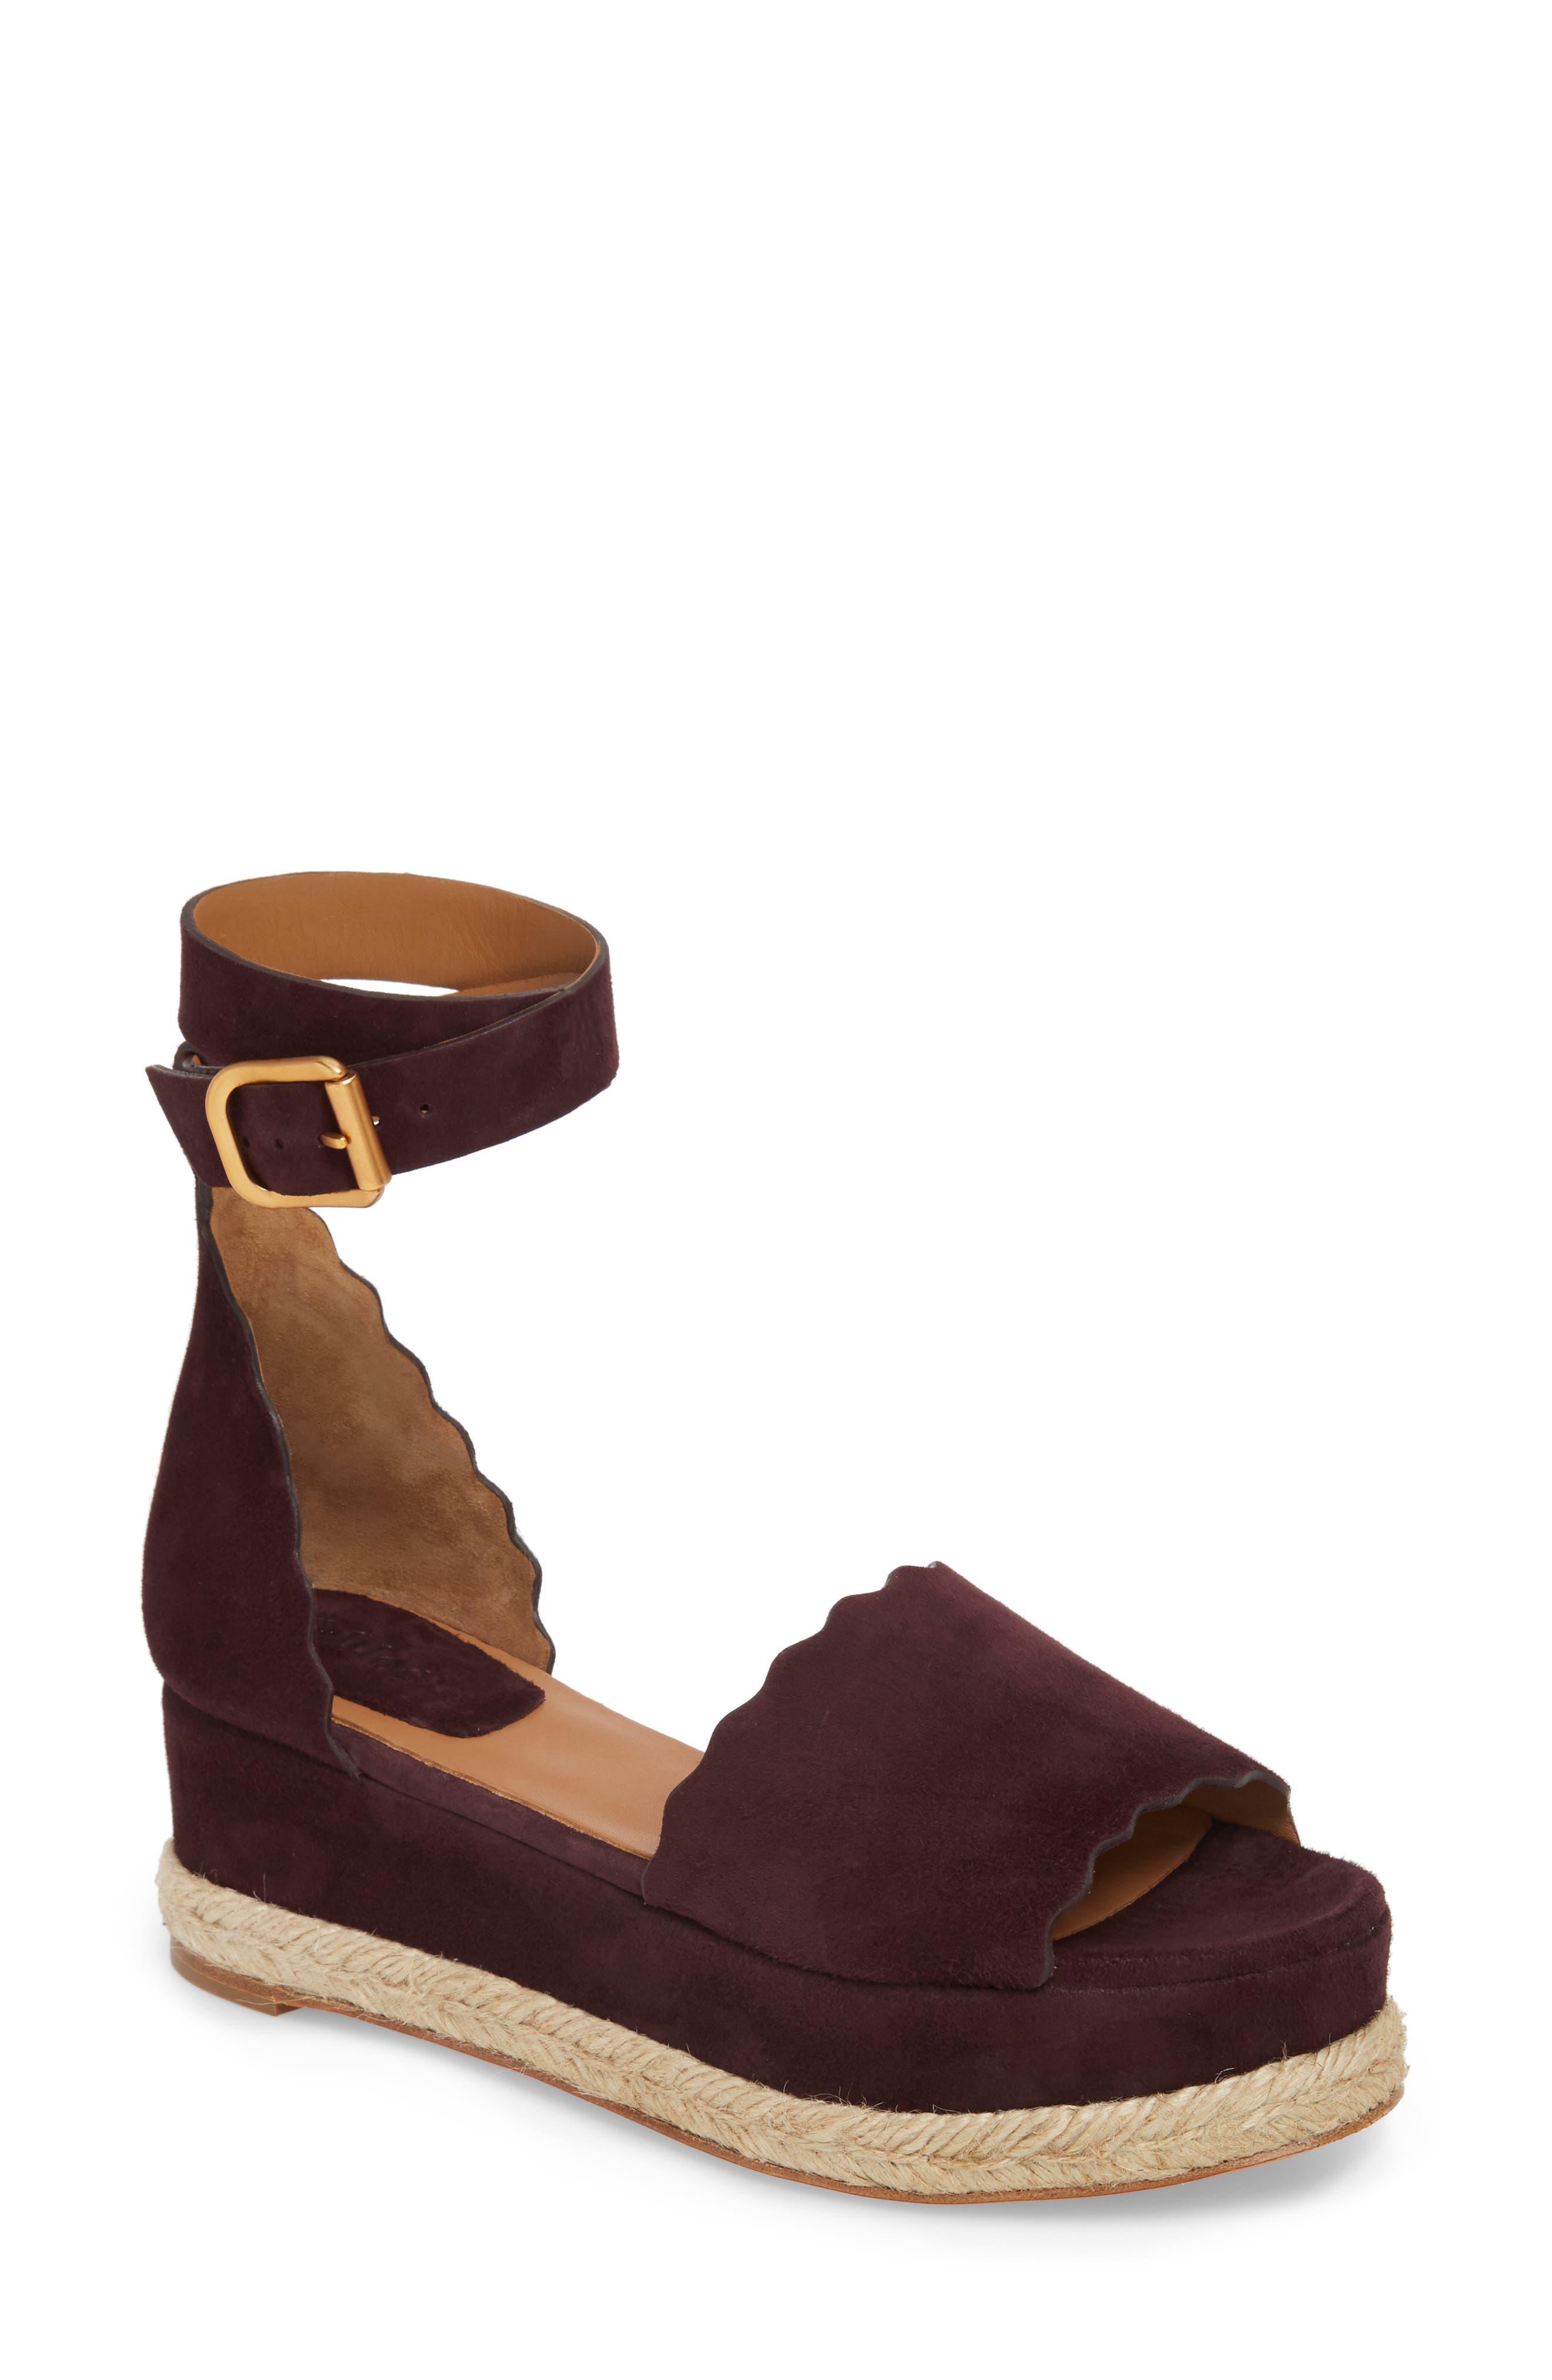 Lauren Espadrille Wedge Sandal,                             Main thumbnail 1, color,                             Dark Purple